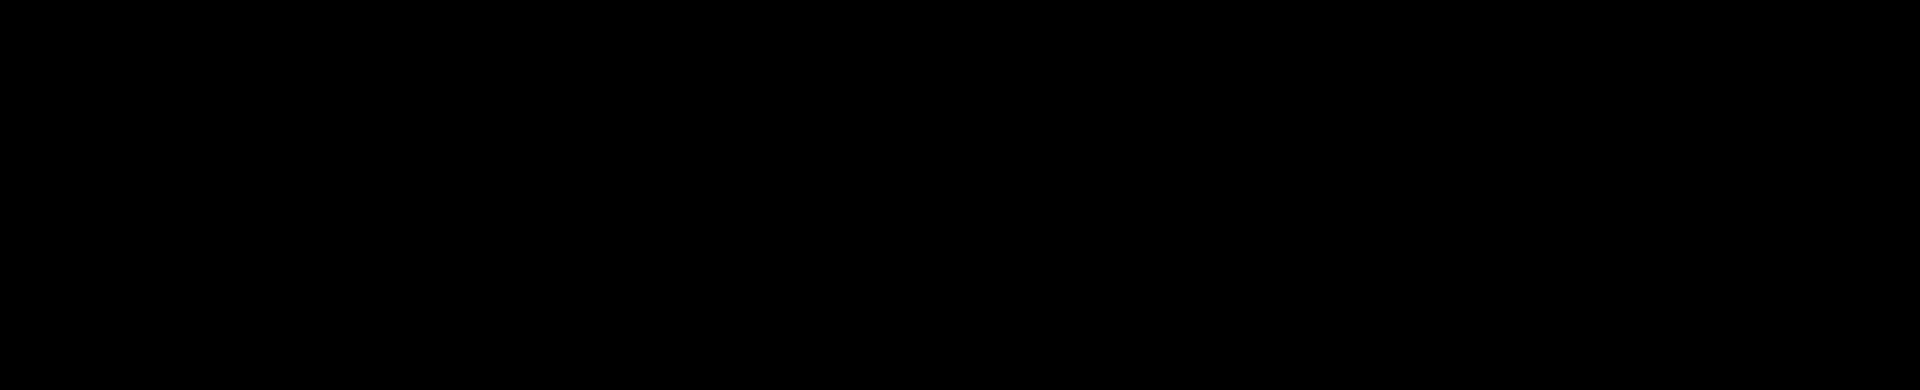 Harmony Home Buyer logo